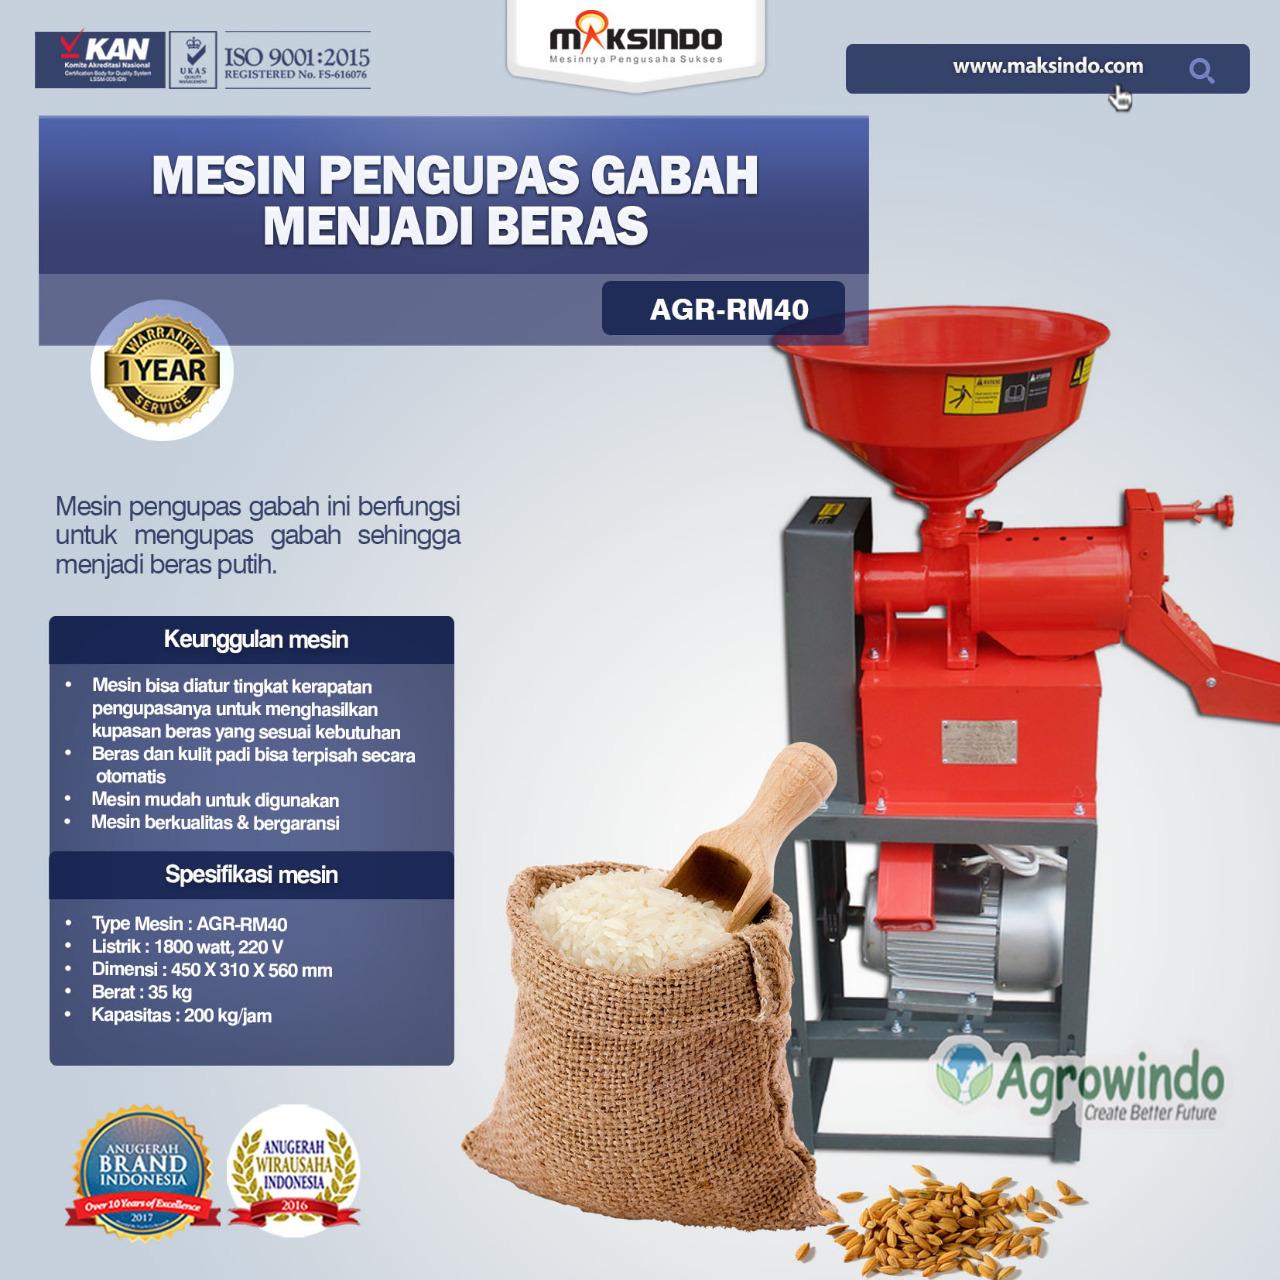 Jual Mesin Rice Huller Mini Pengupas Gabah – Beras AGR-RM40 di Makassar